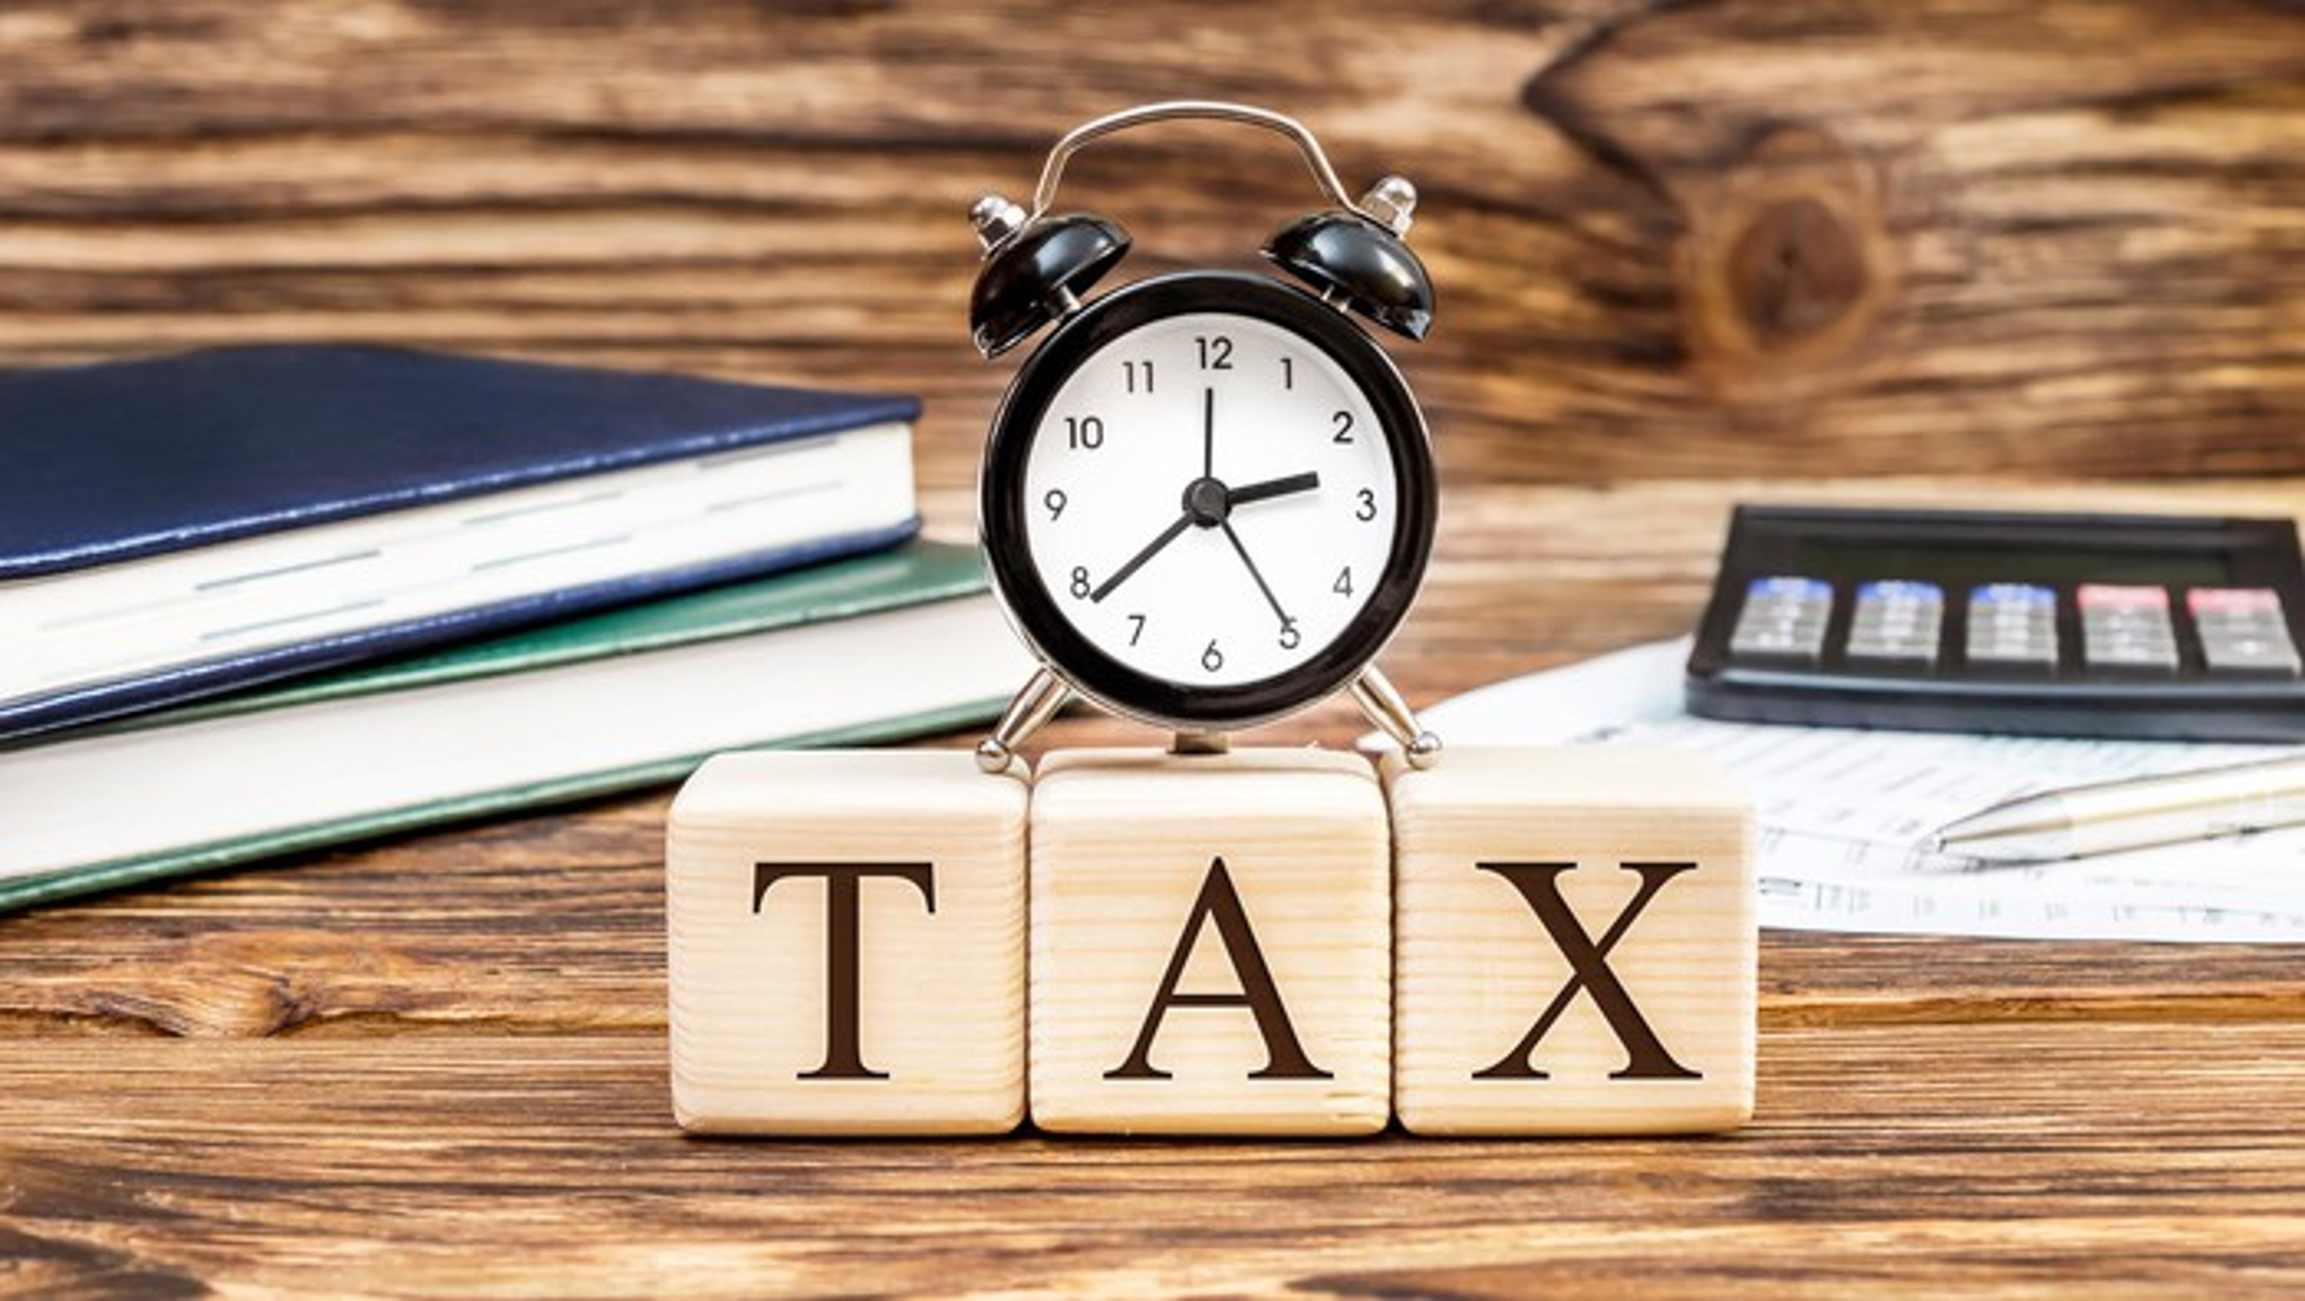 Tax on office clock